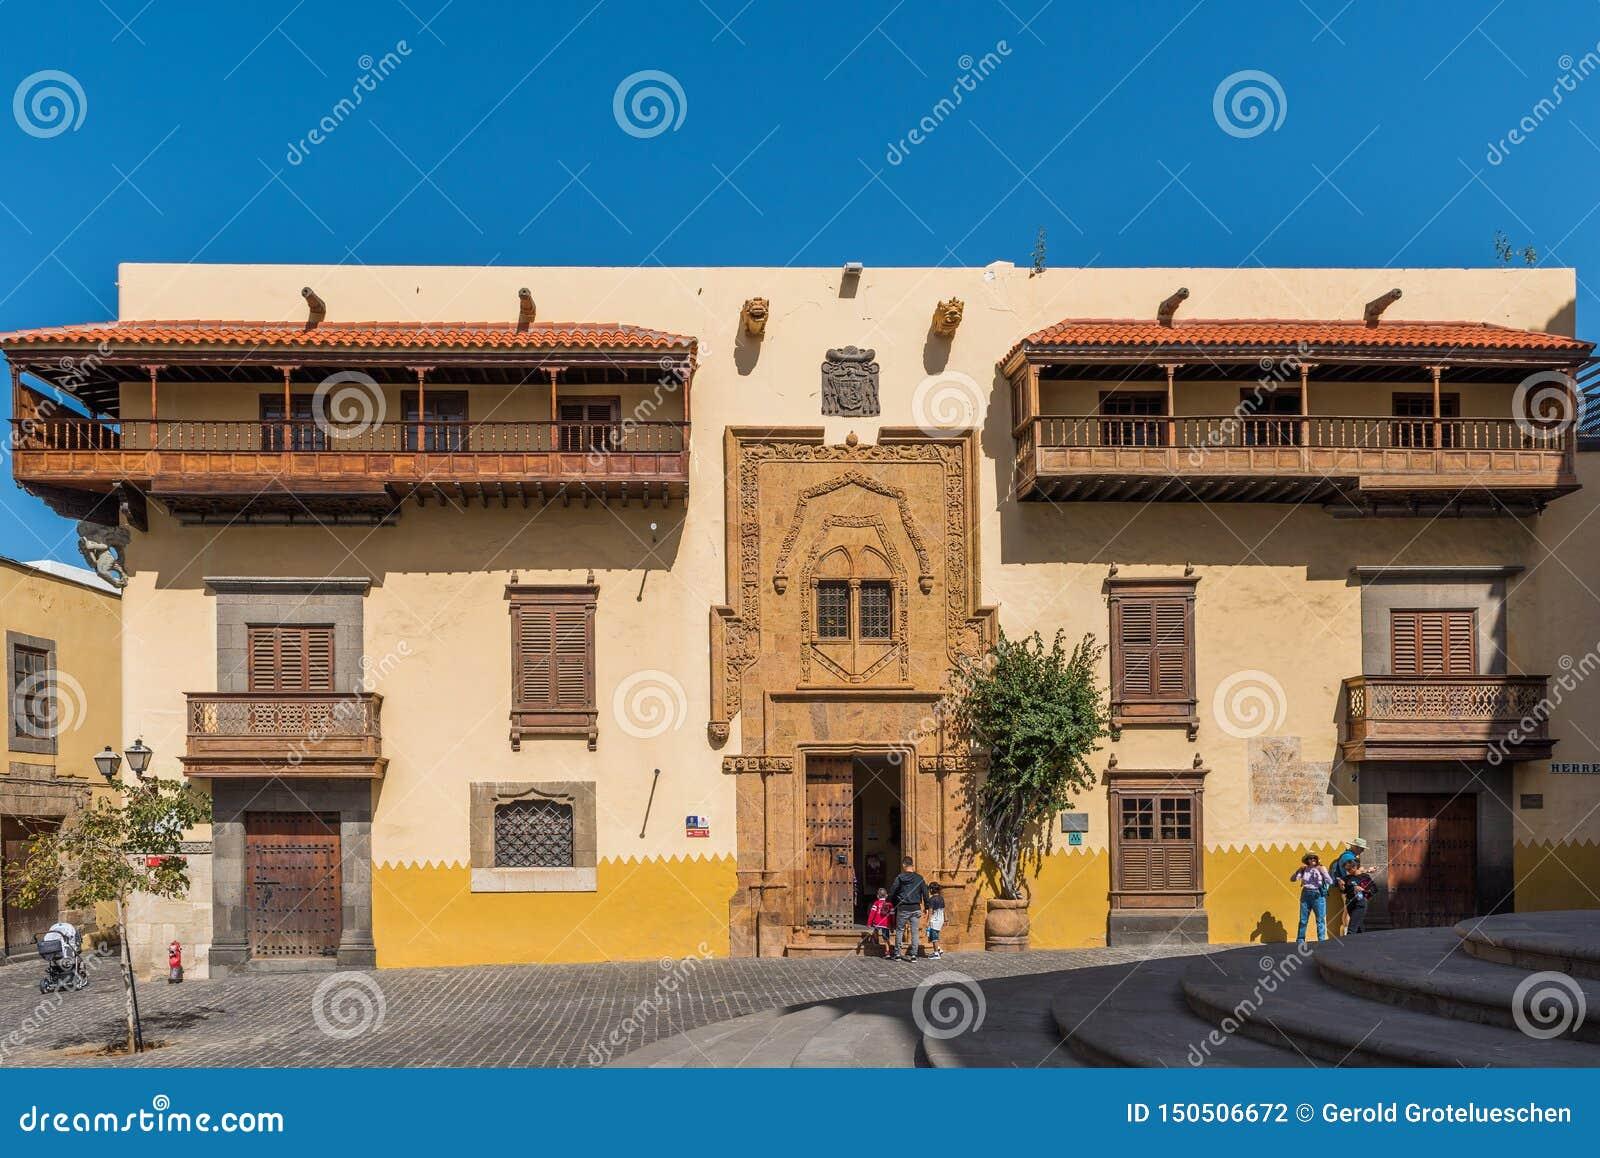 Kolumb dom w Las Palmas De Gran Canaria, Hiszpania